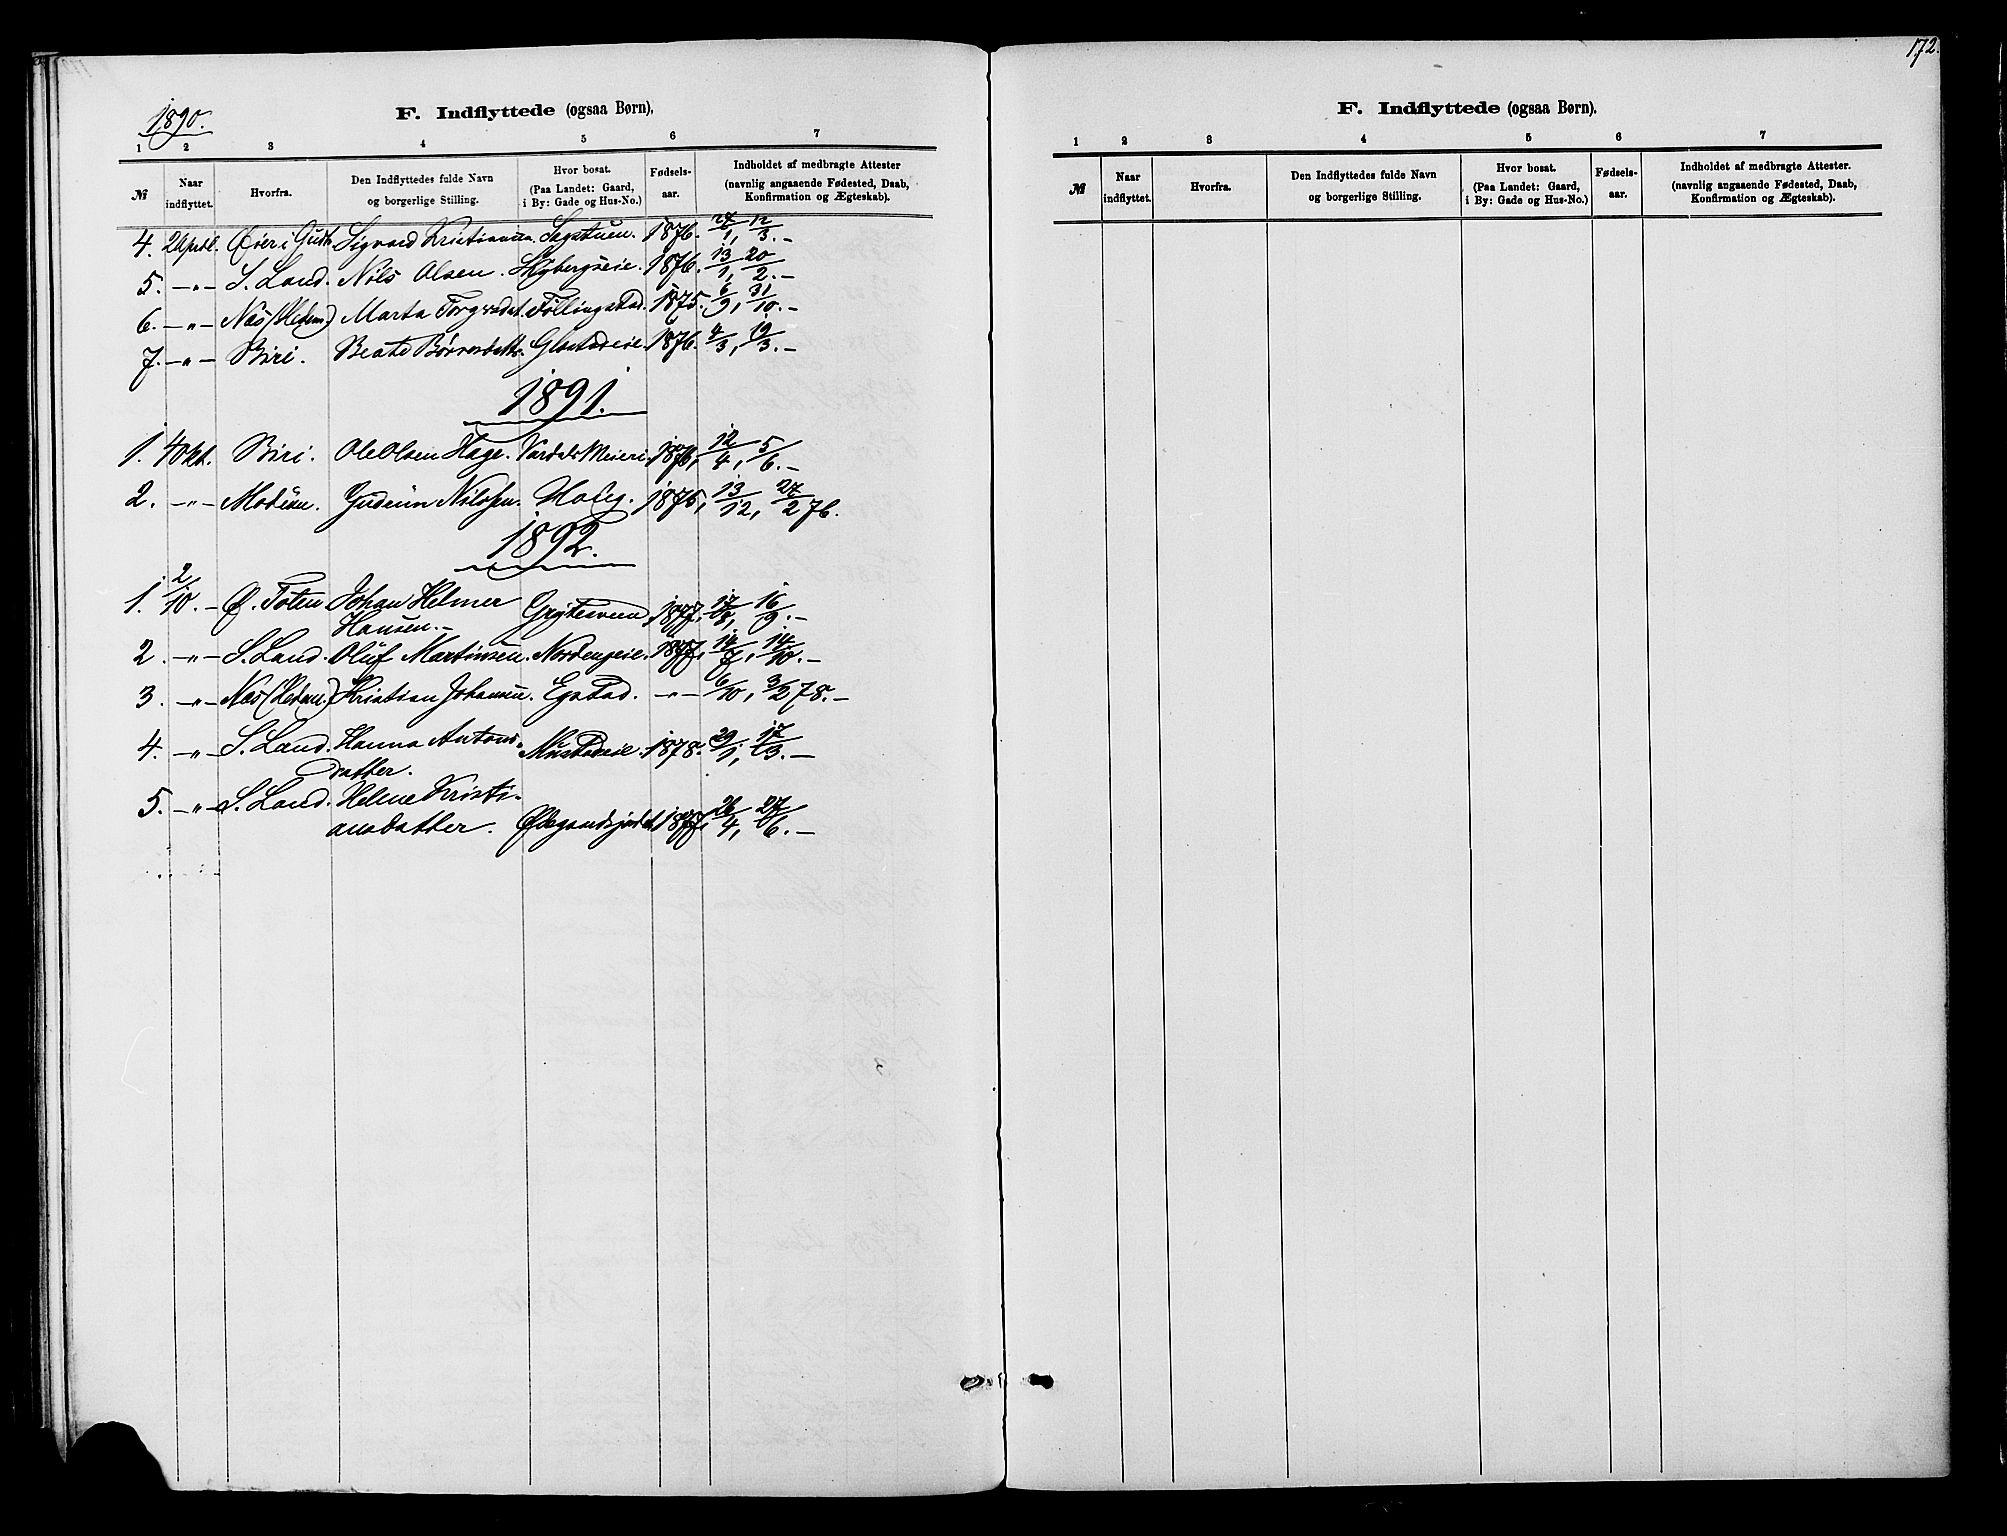 SAH, Vardal prestekontor, H/Ha/Haa/L0010: Ministerialbok nr. 10, 1878-1893, s. 172